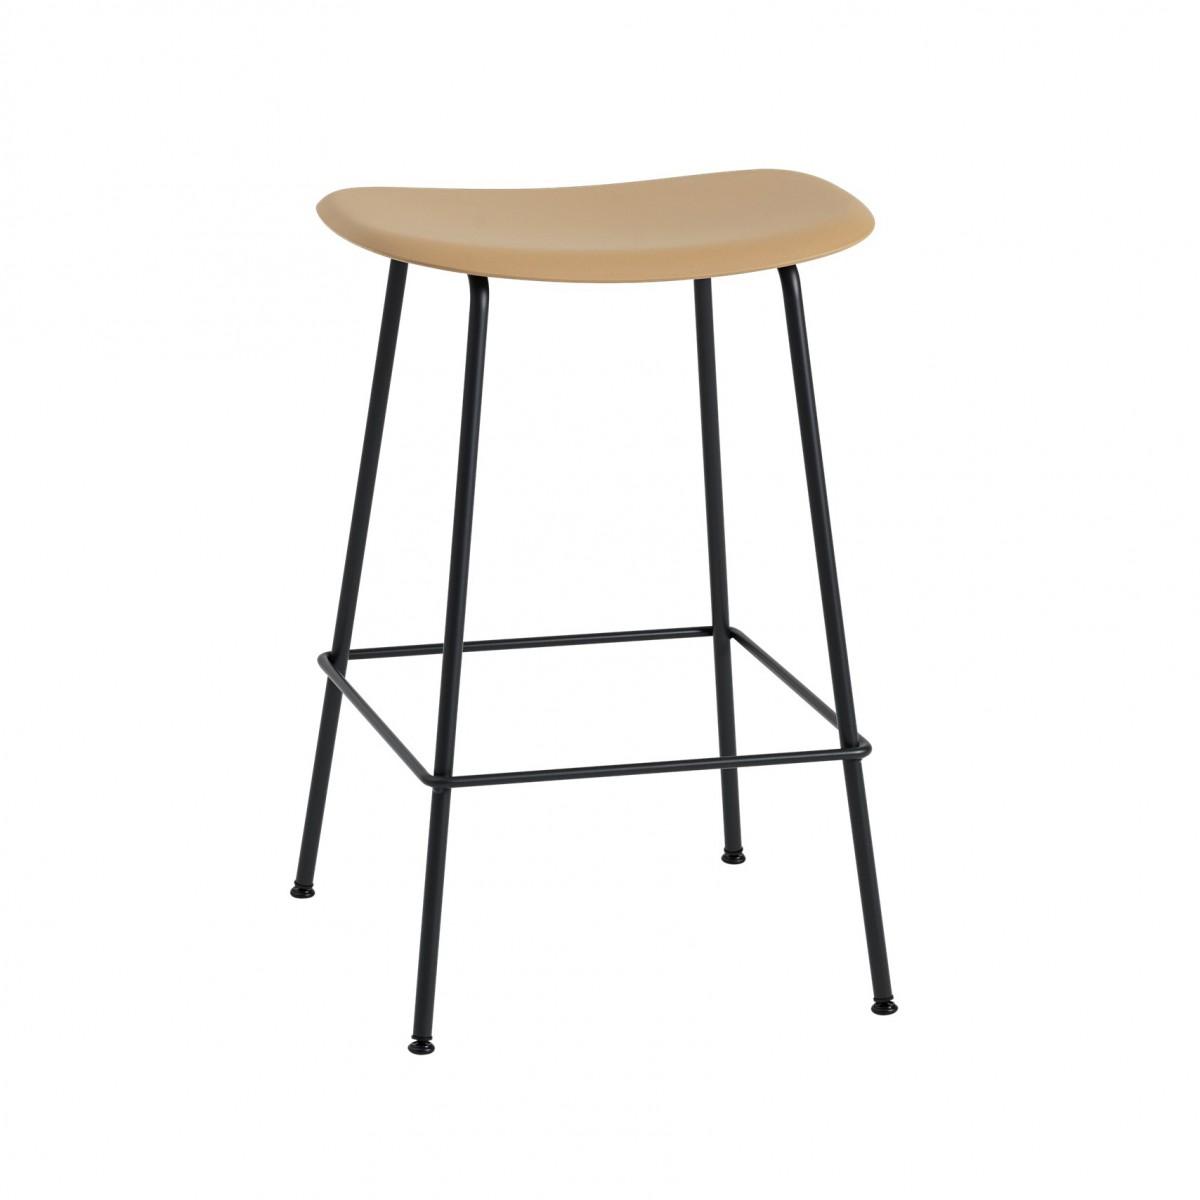 Excellent Fiber Stool Black Tube Base Muuto Machost Co Dining Chair Design Ideas Machostcouk